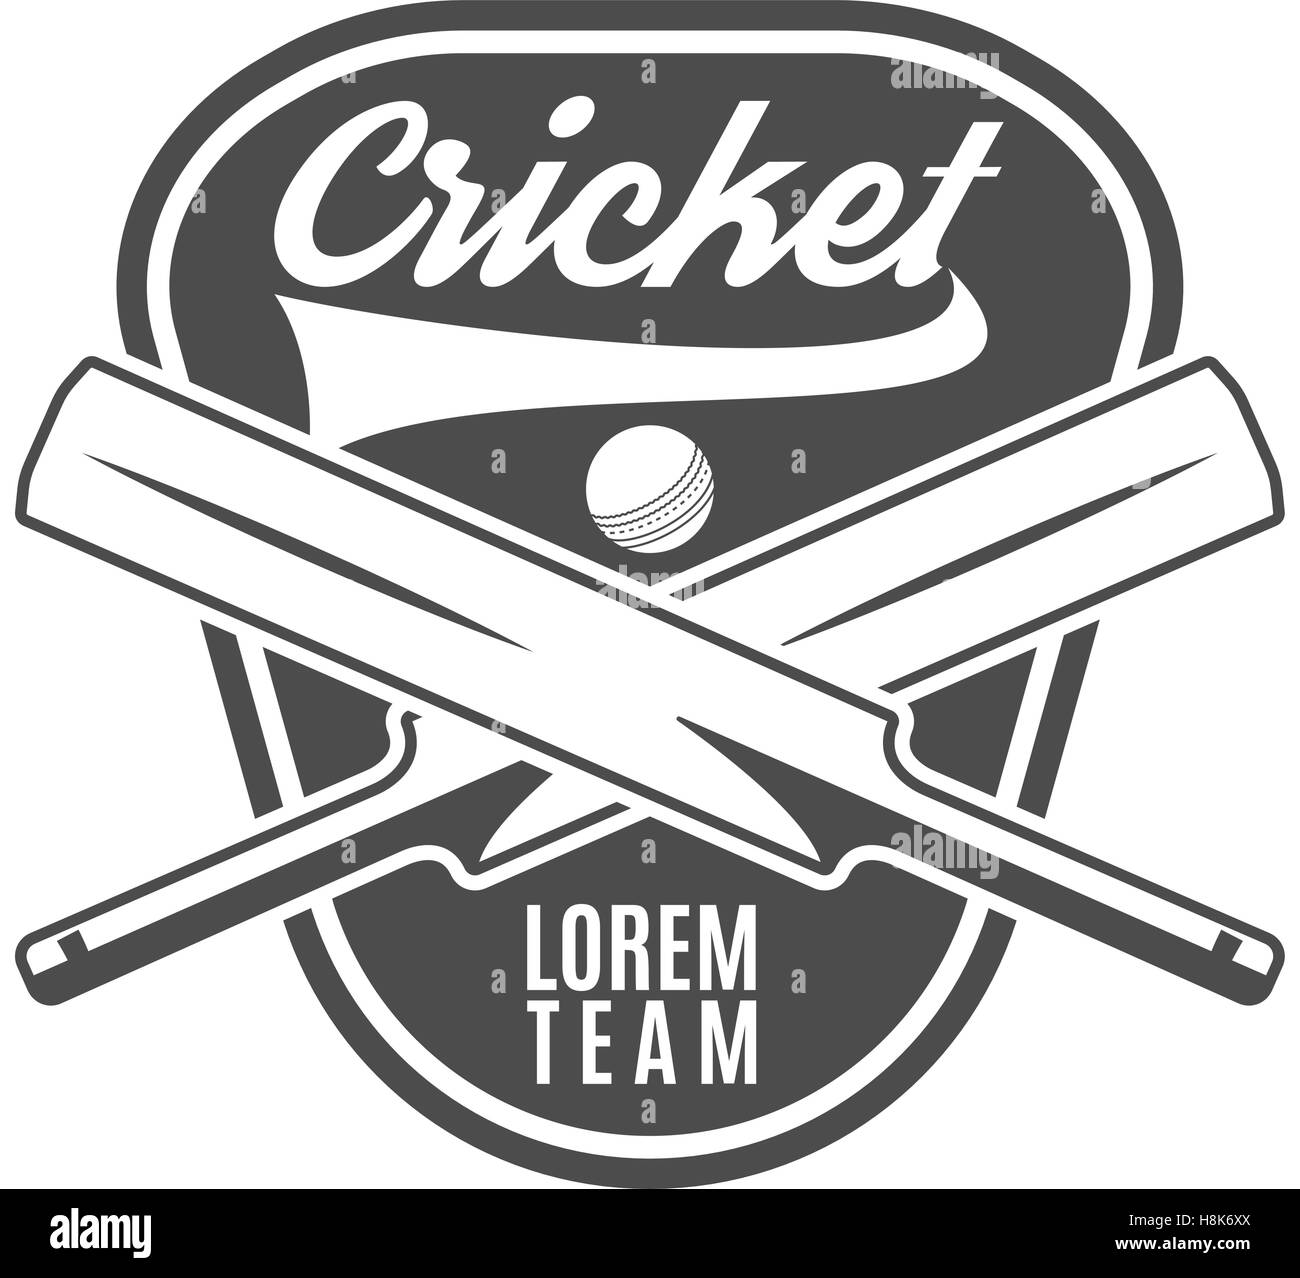 Cricket Team Emblem And Design Elements Cricket Team Logo Design